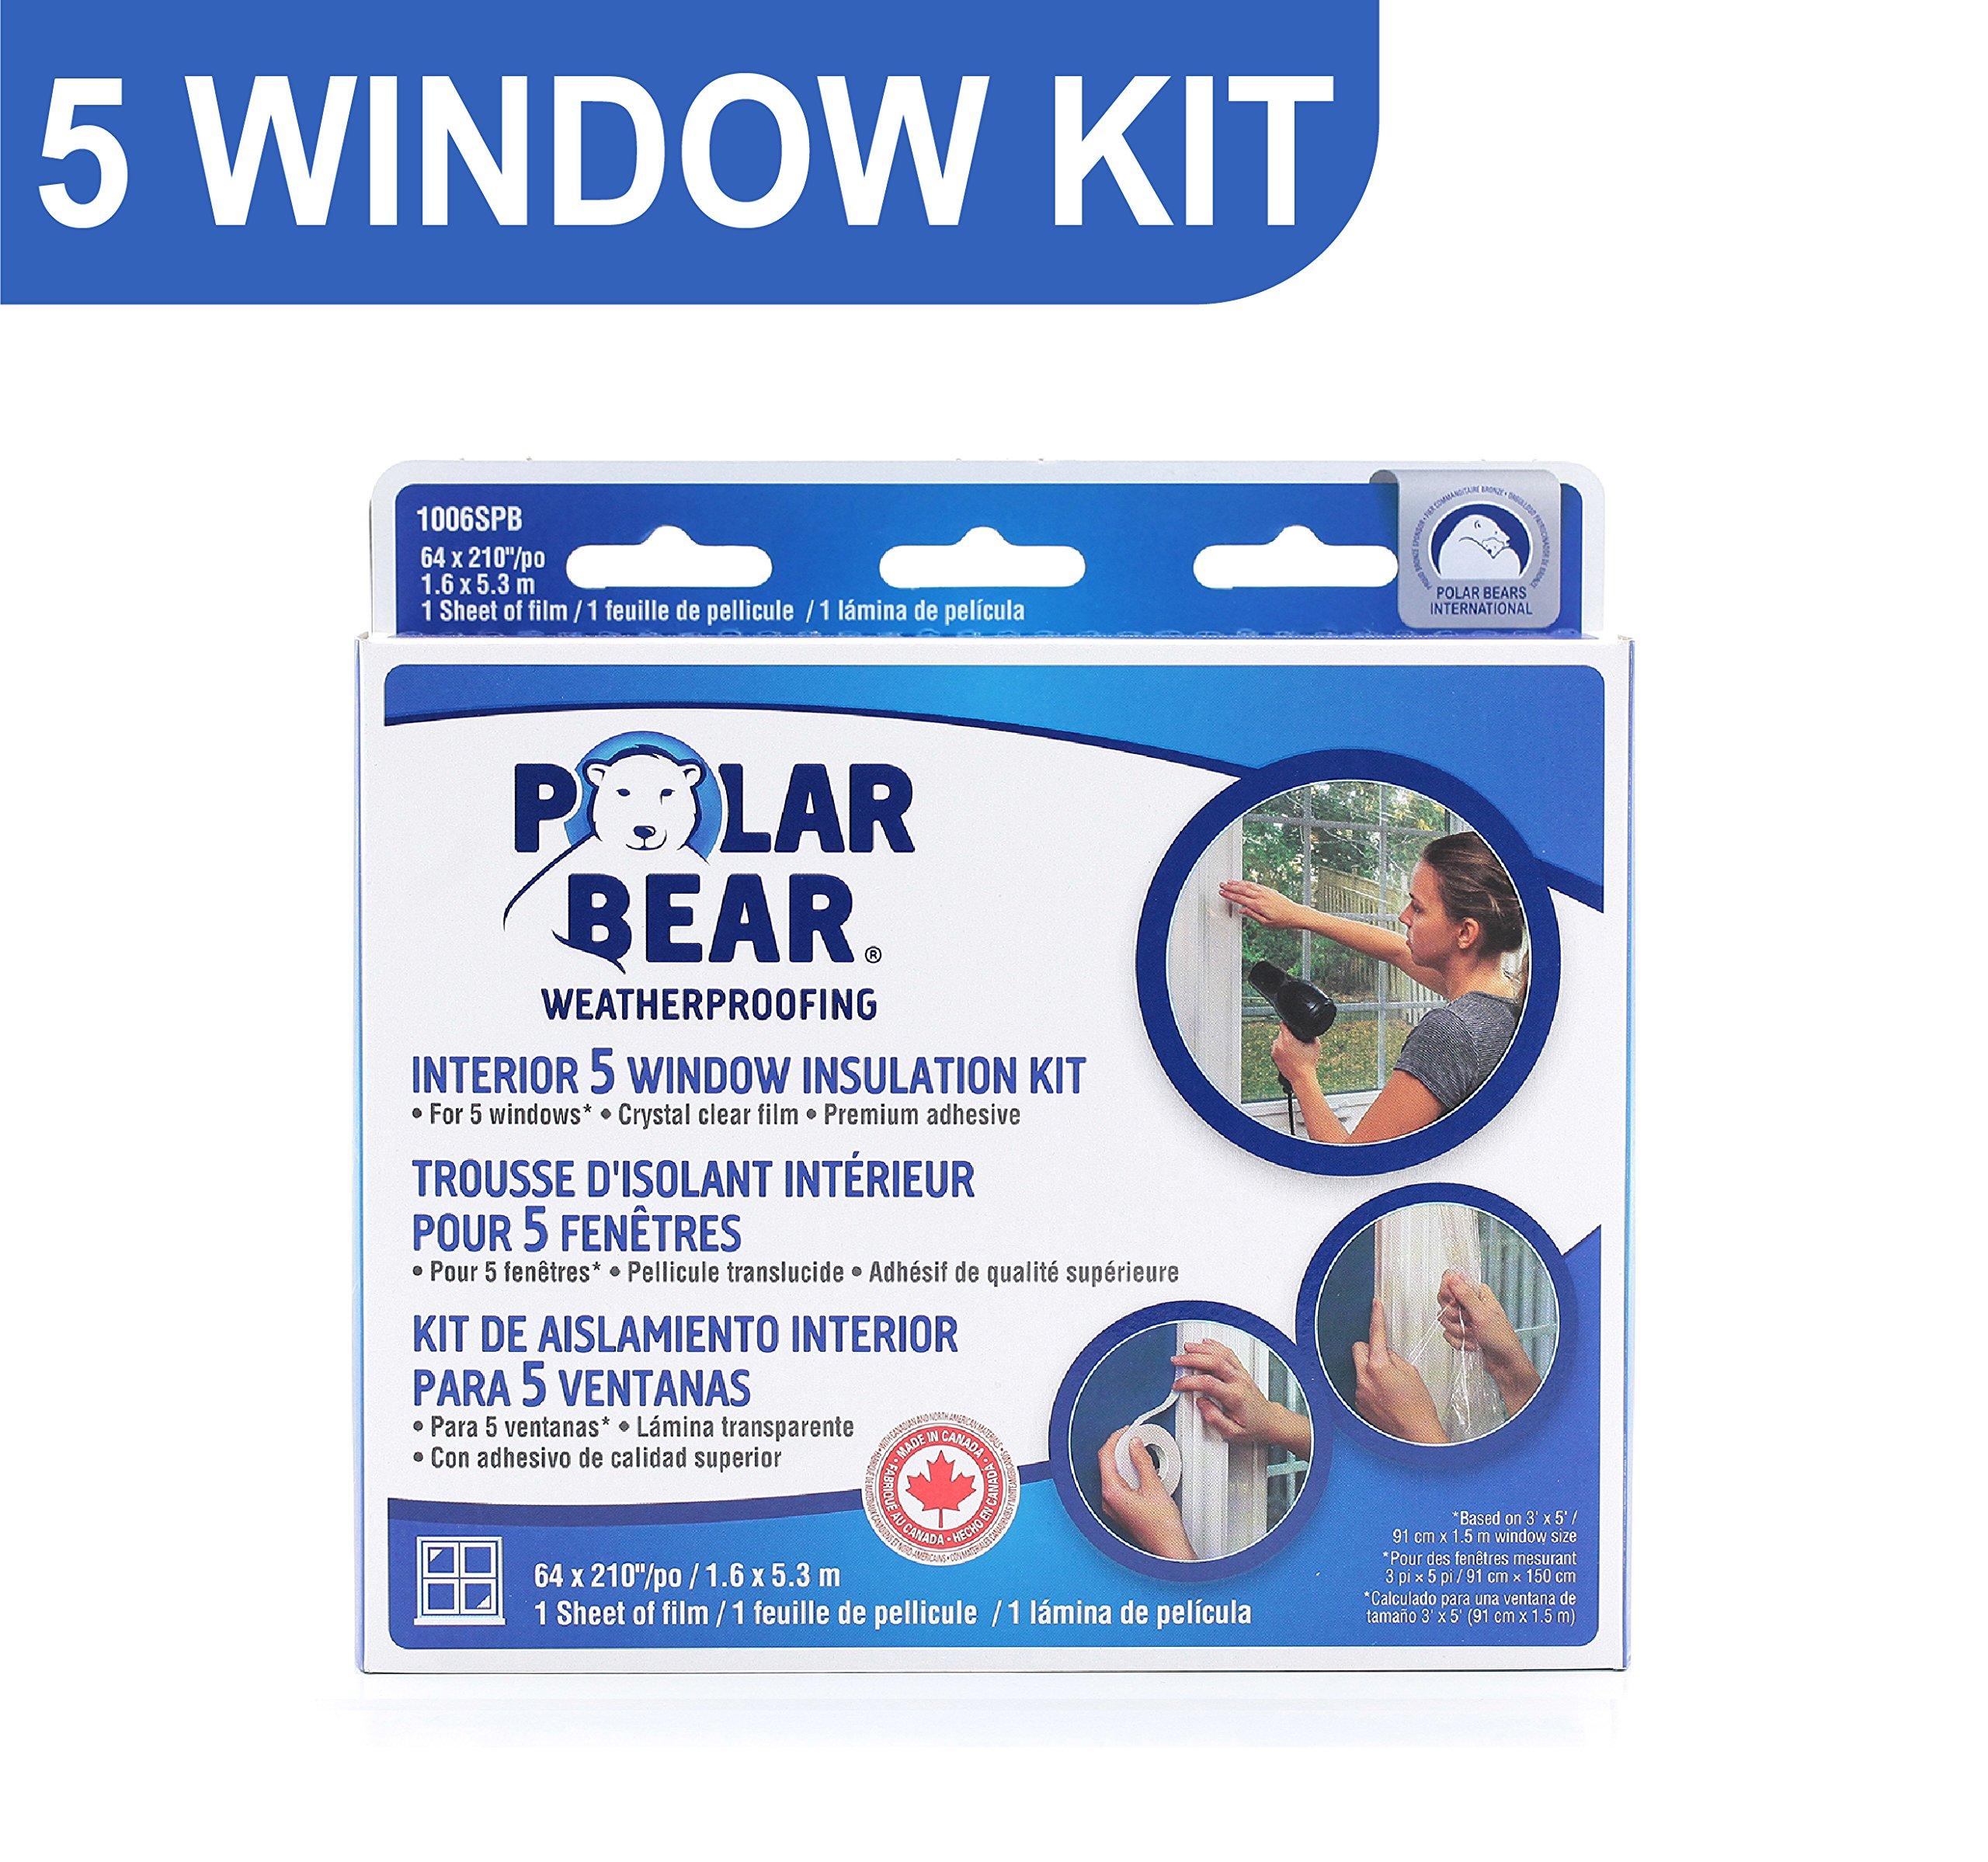 Polar Bear Weatherproofing Standard 5 Window Insulation Film Kit - 62 Inch x 210 Inch - Crystal Clear Film